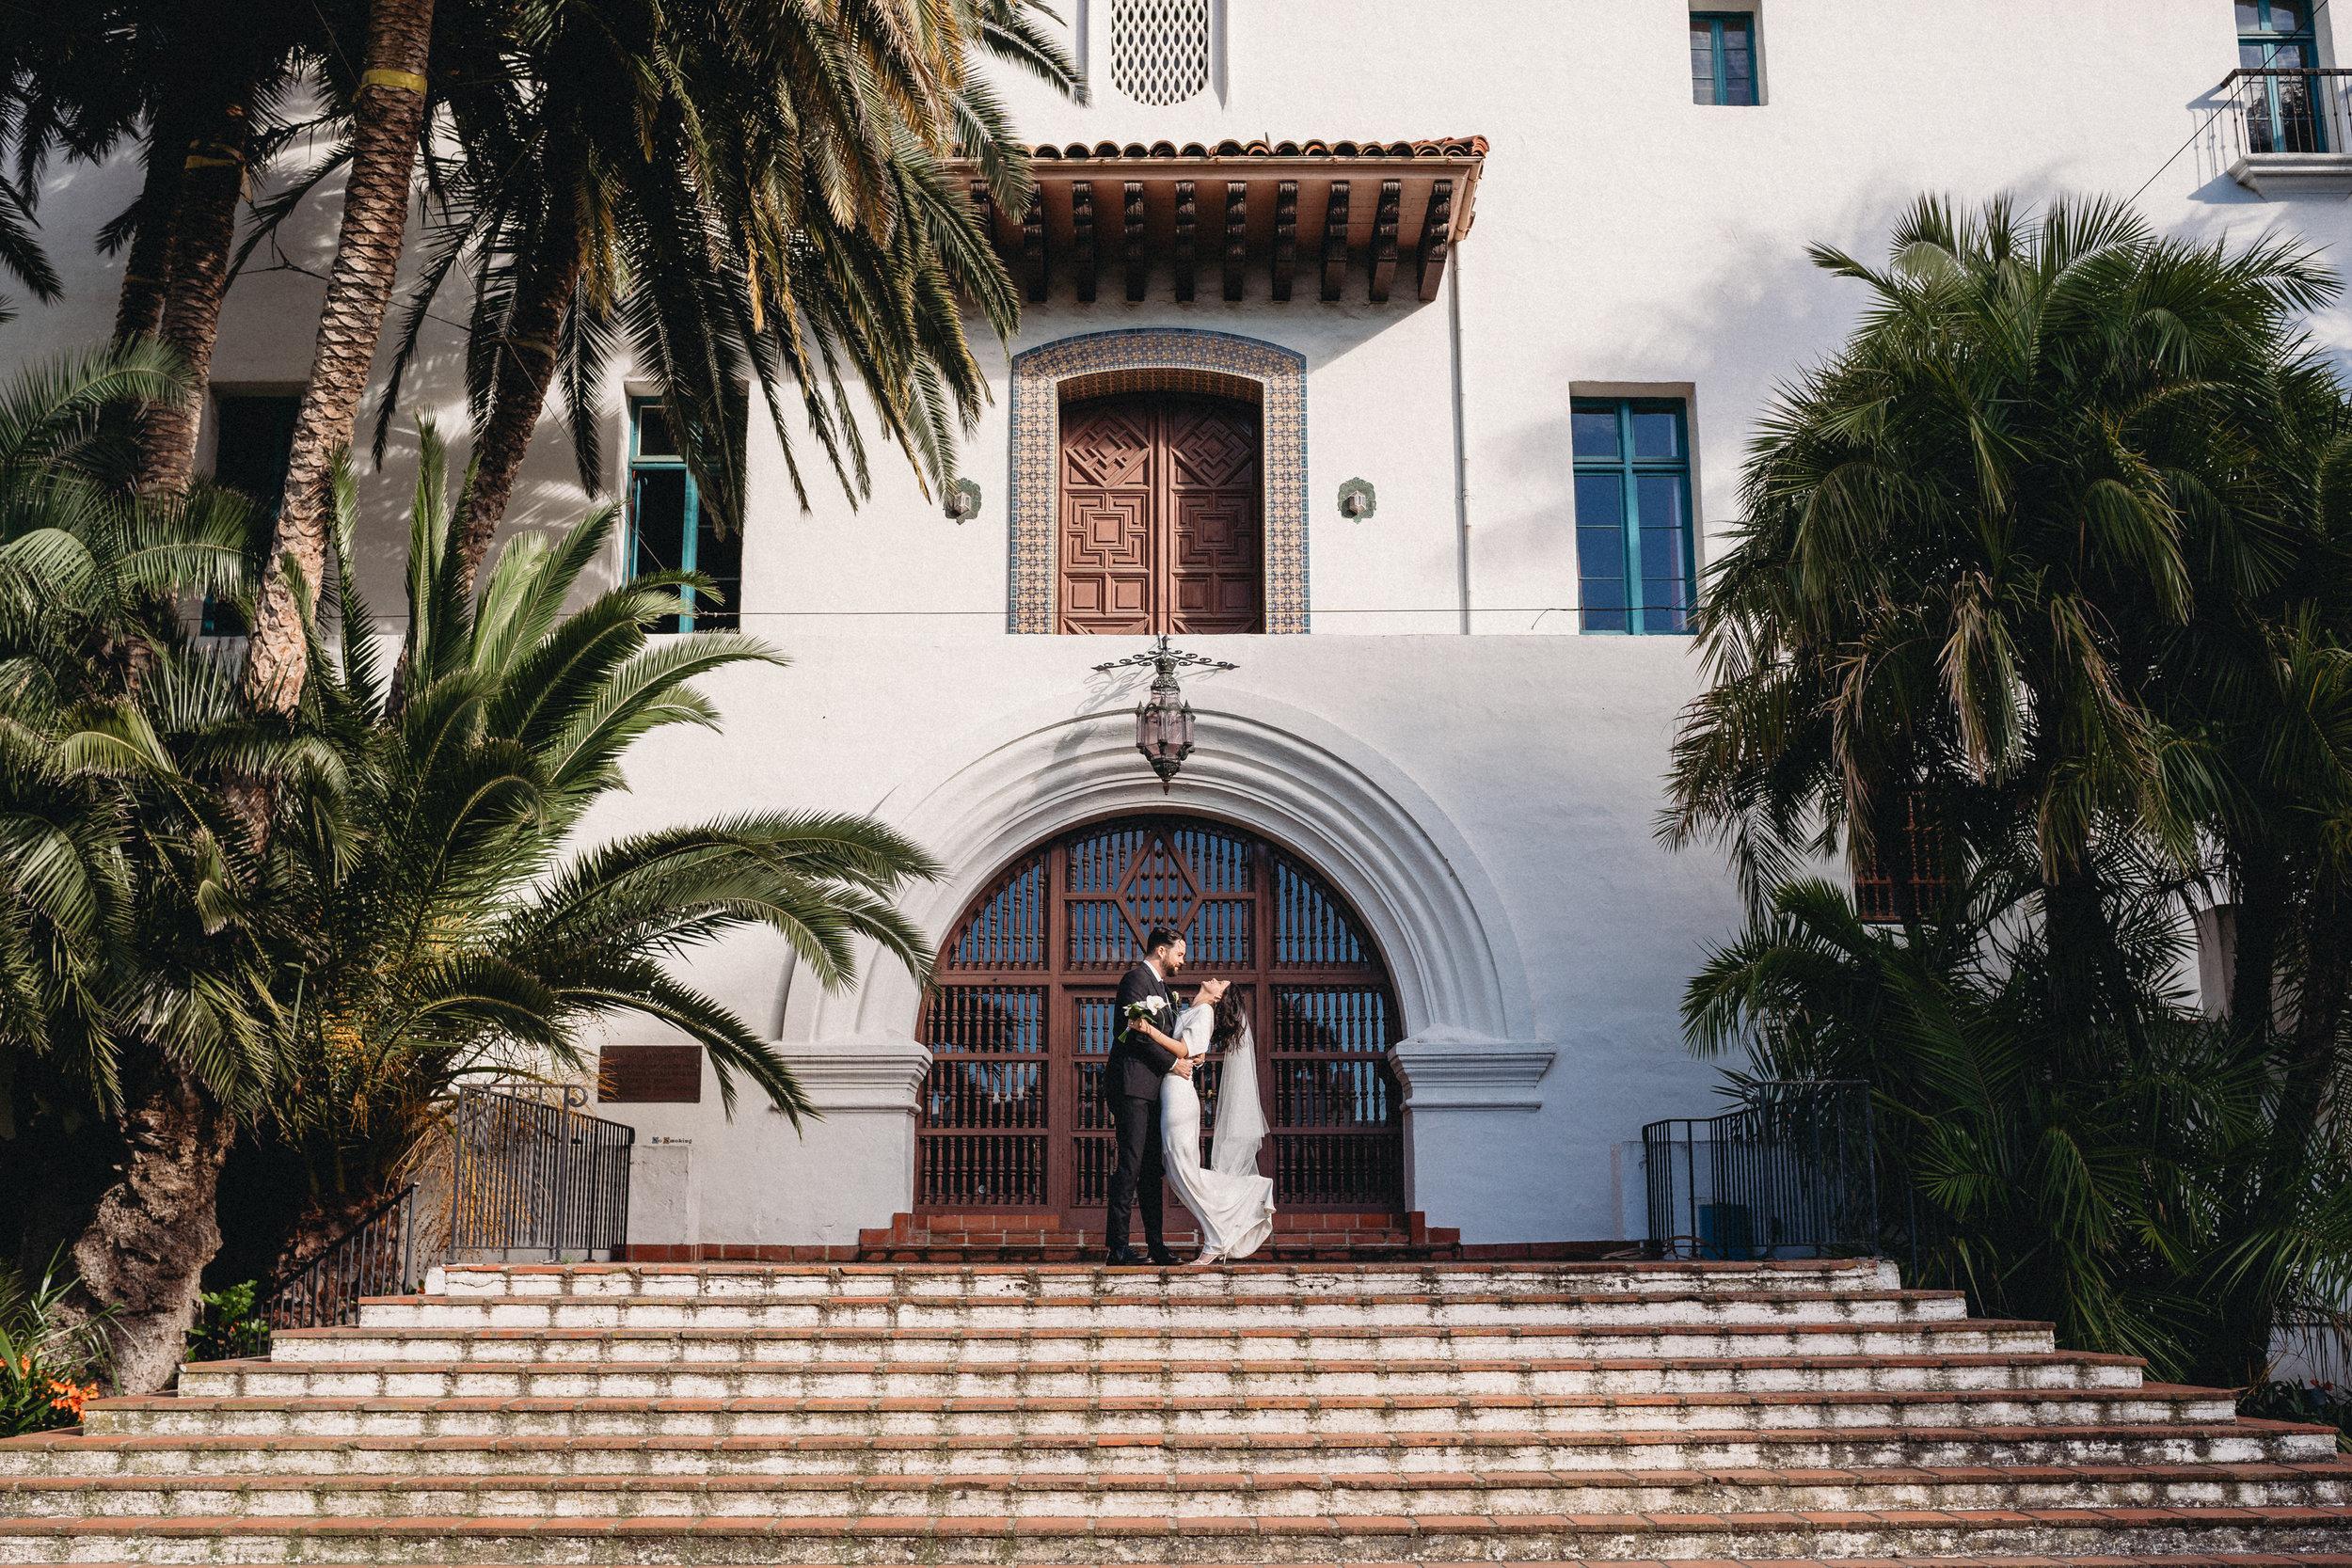 wedding-photography-santa-barbara-courthouse-rebeccaylasotras-133.jpg